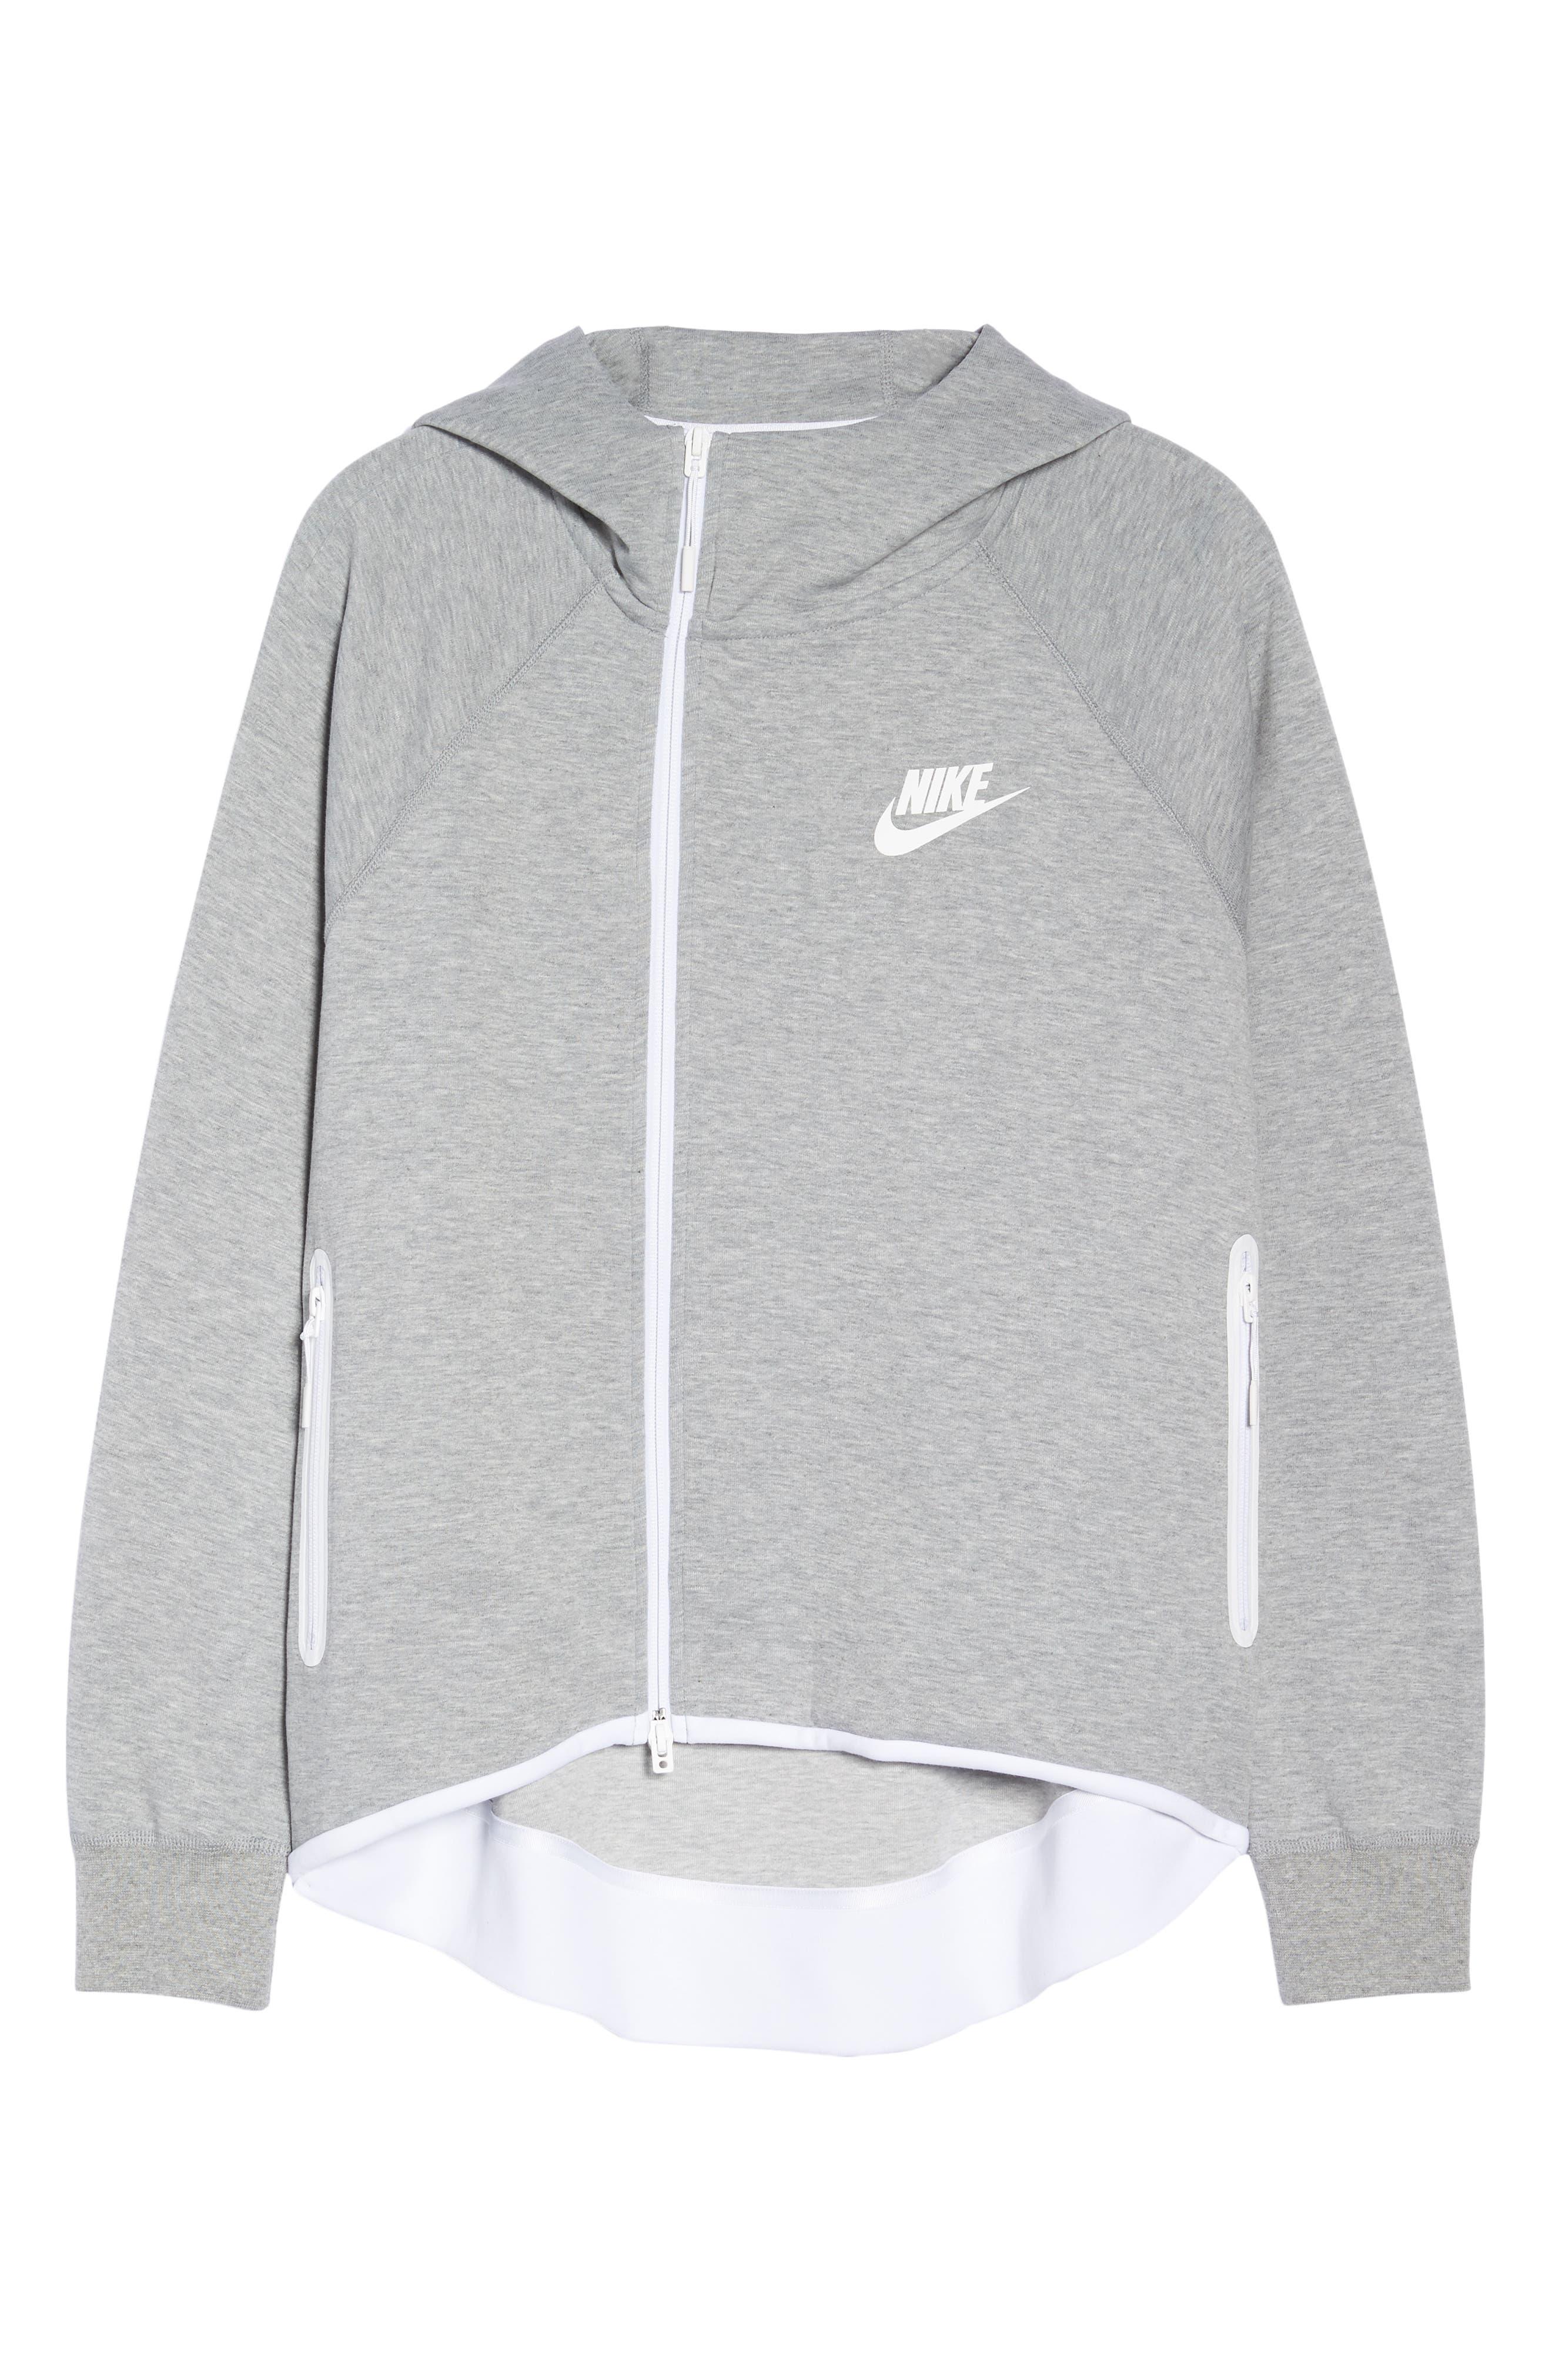 Sportswear Tech Fleece Cape Jacket,                             Alternate thumbnail 7, color,                             DARK GREY HEATHER/ WHITE